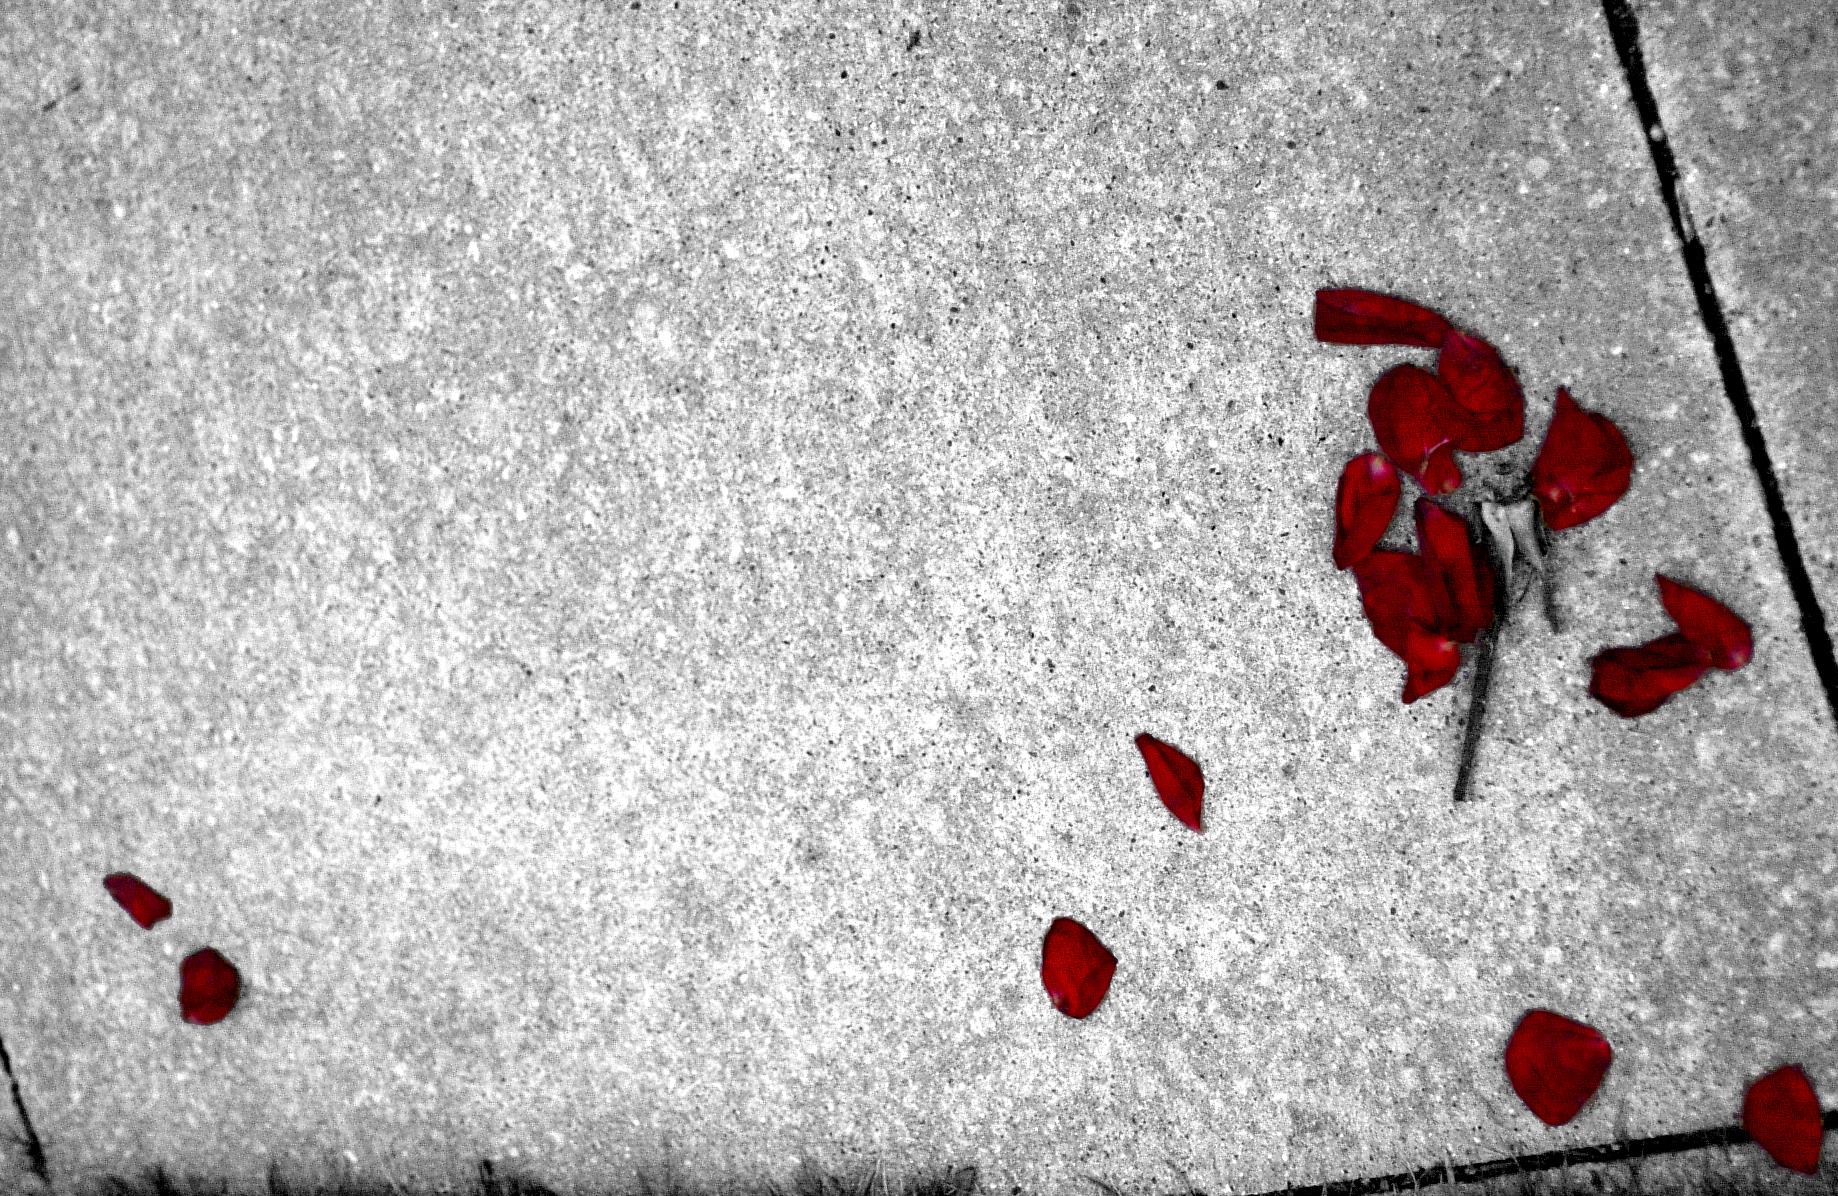 Falling Rose Petals Wallpaper The Road Of Rose Petals Wallpapers High Quality Download